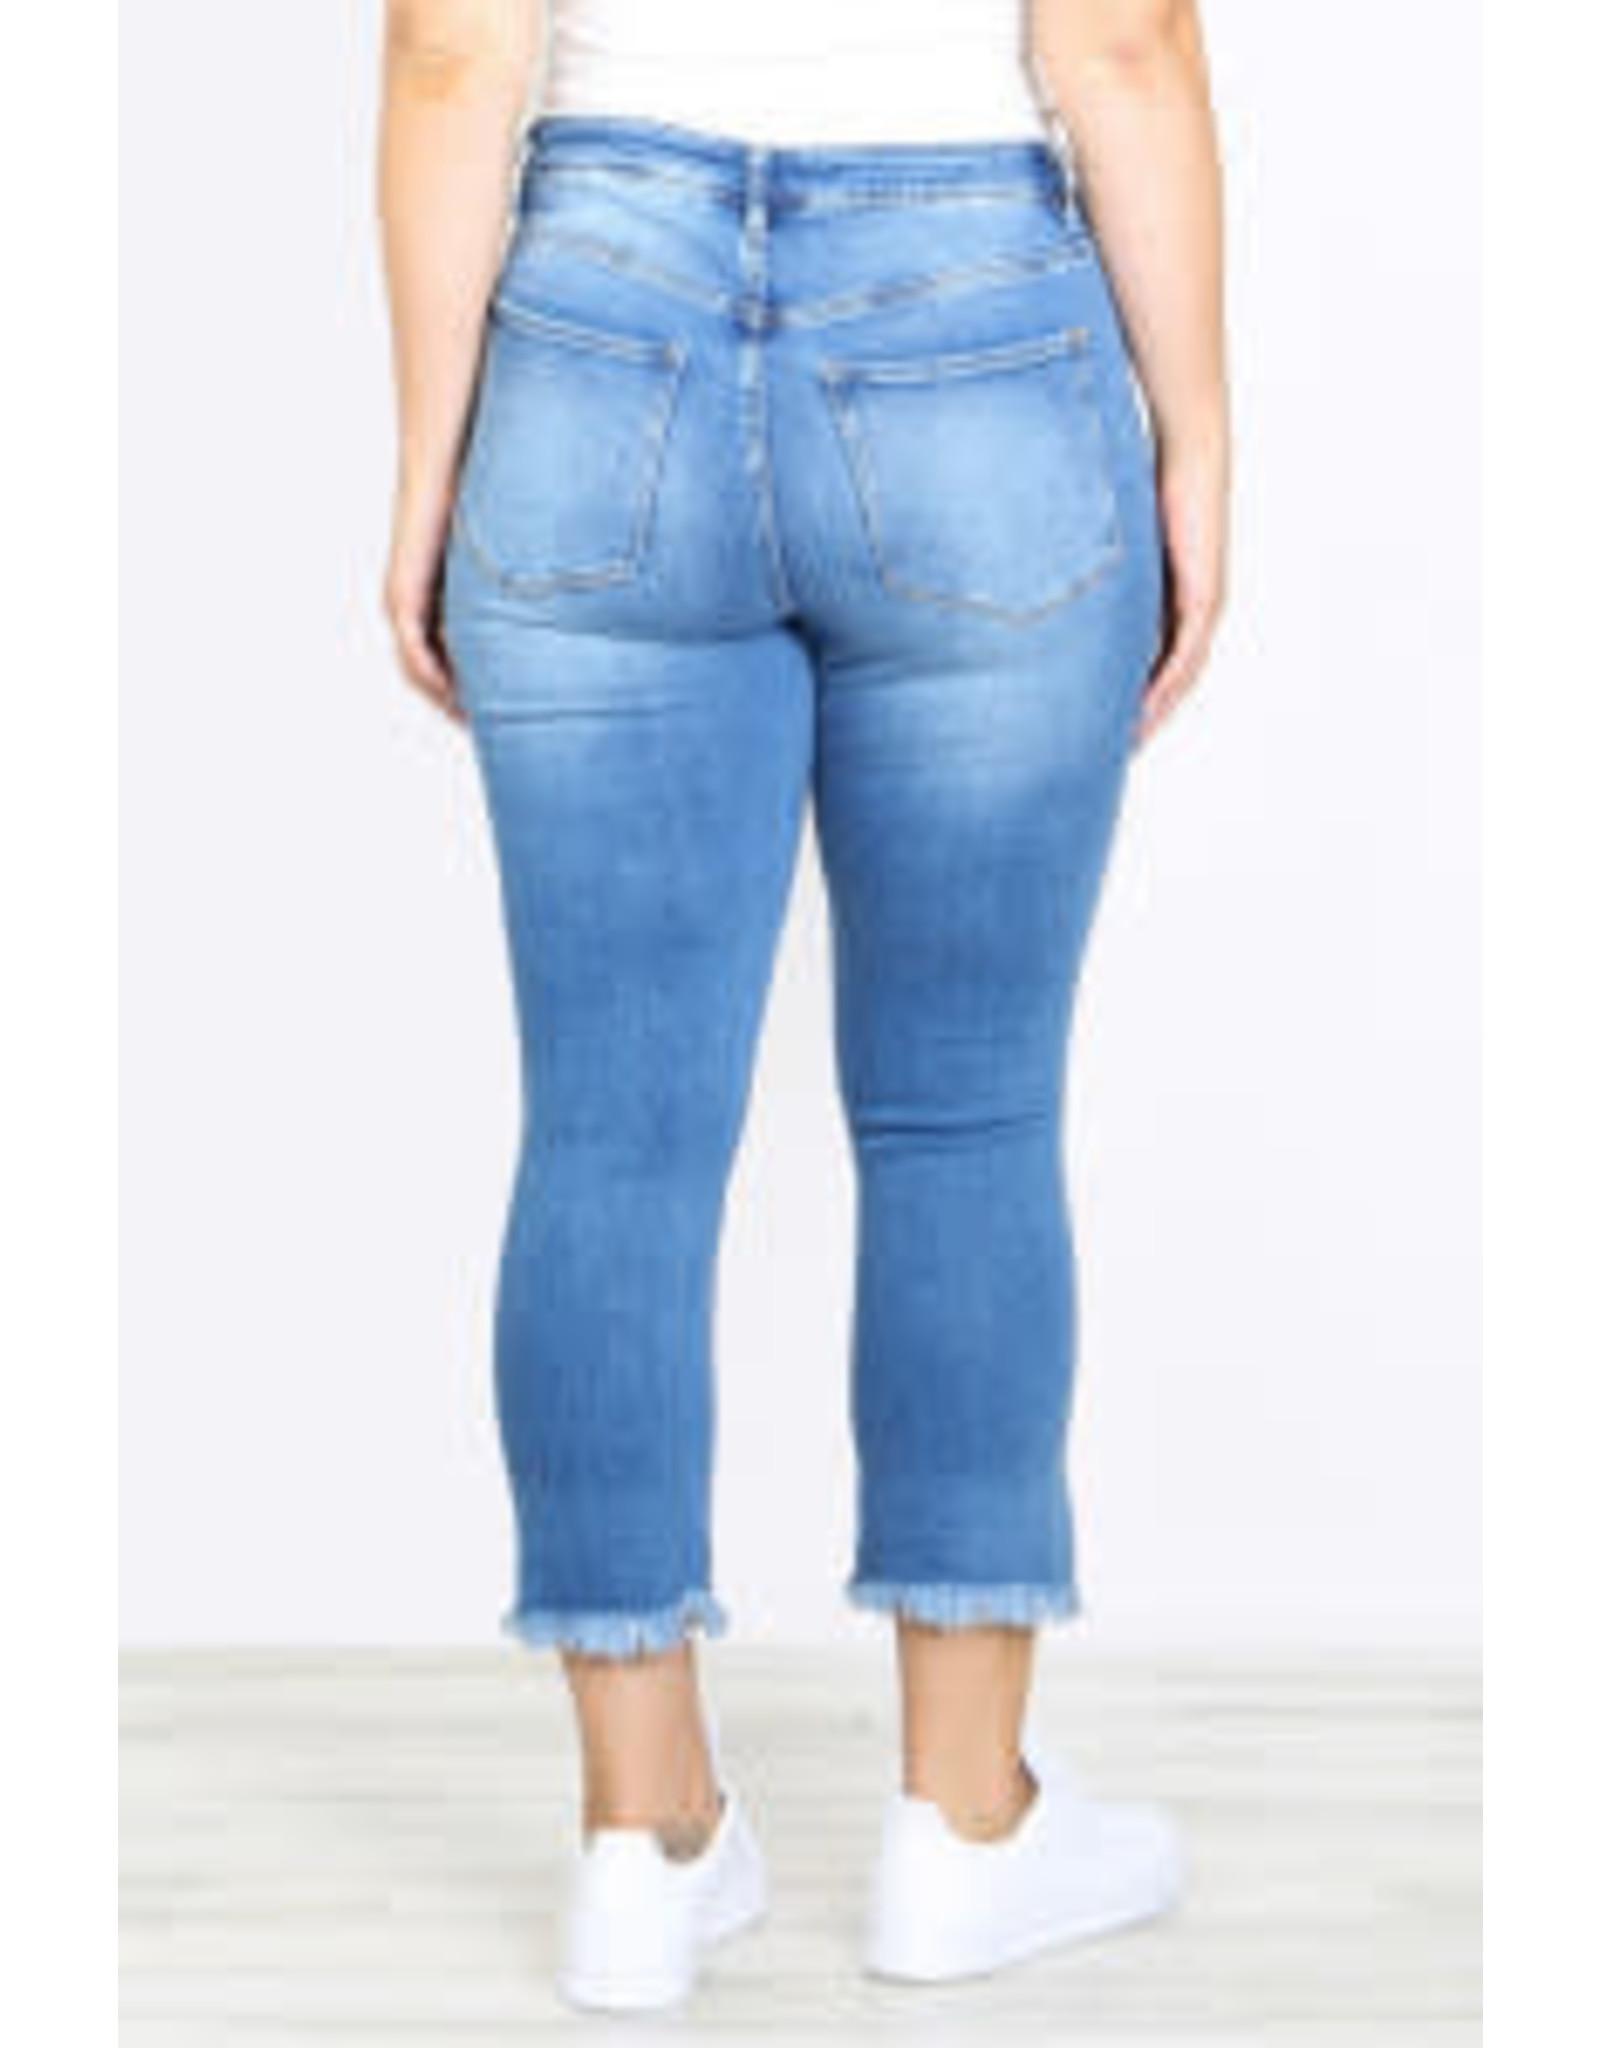 Slim Fit Distressed Raw Hem Cropped Denim Jeans